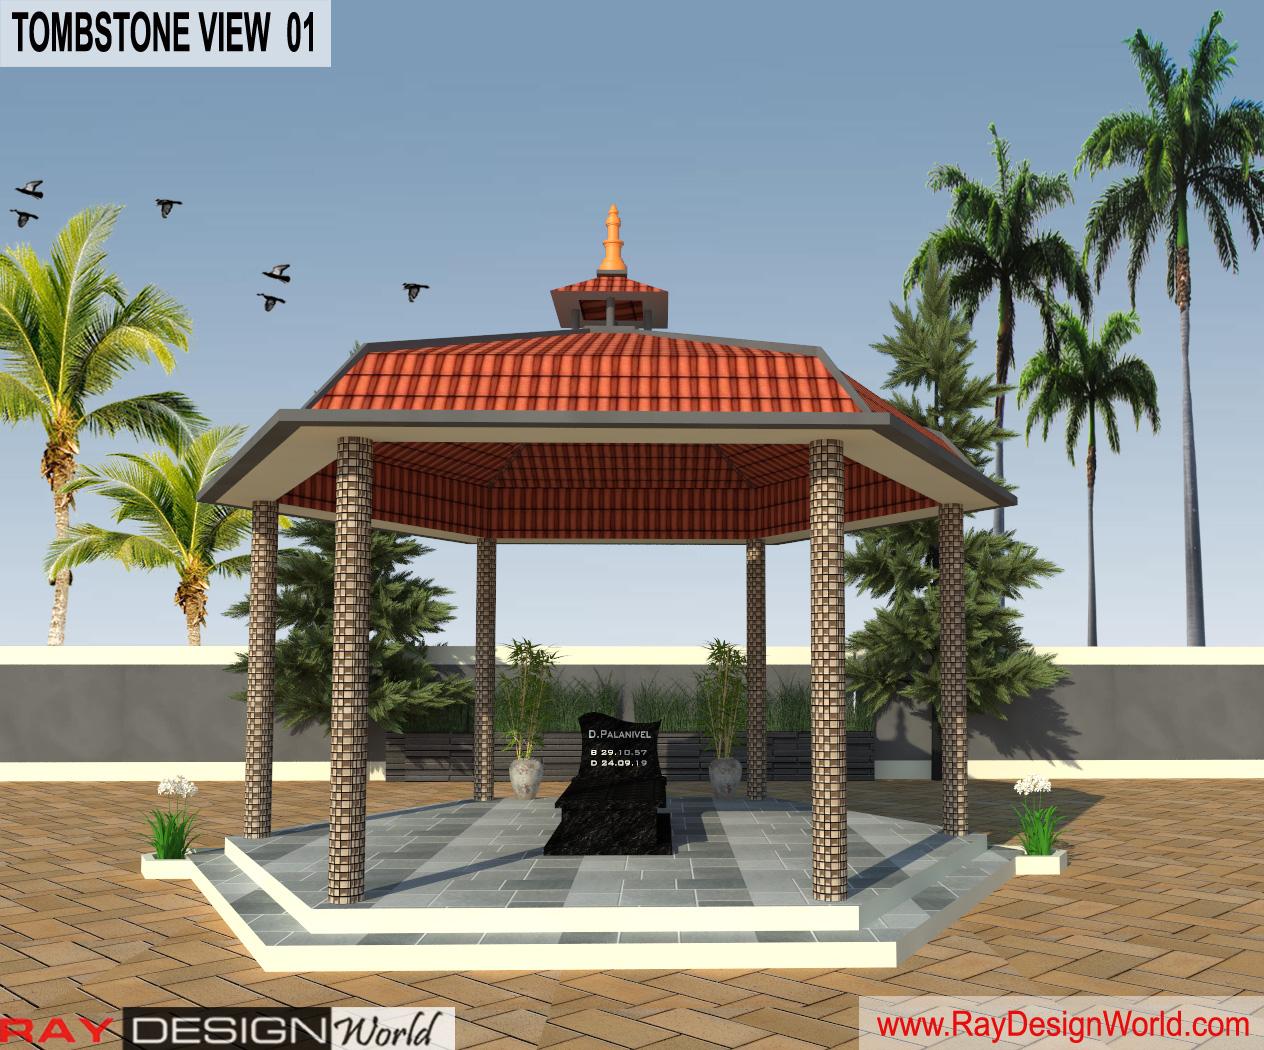 Tomb Stone Design Exterior View 03 - Vriddhachalam Tamil Nadu - Dr. Murugadas